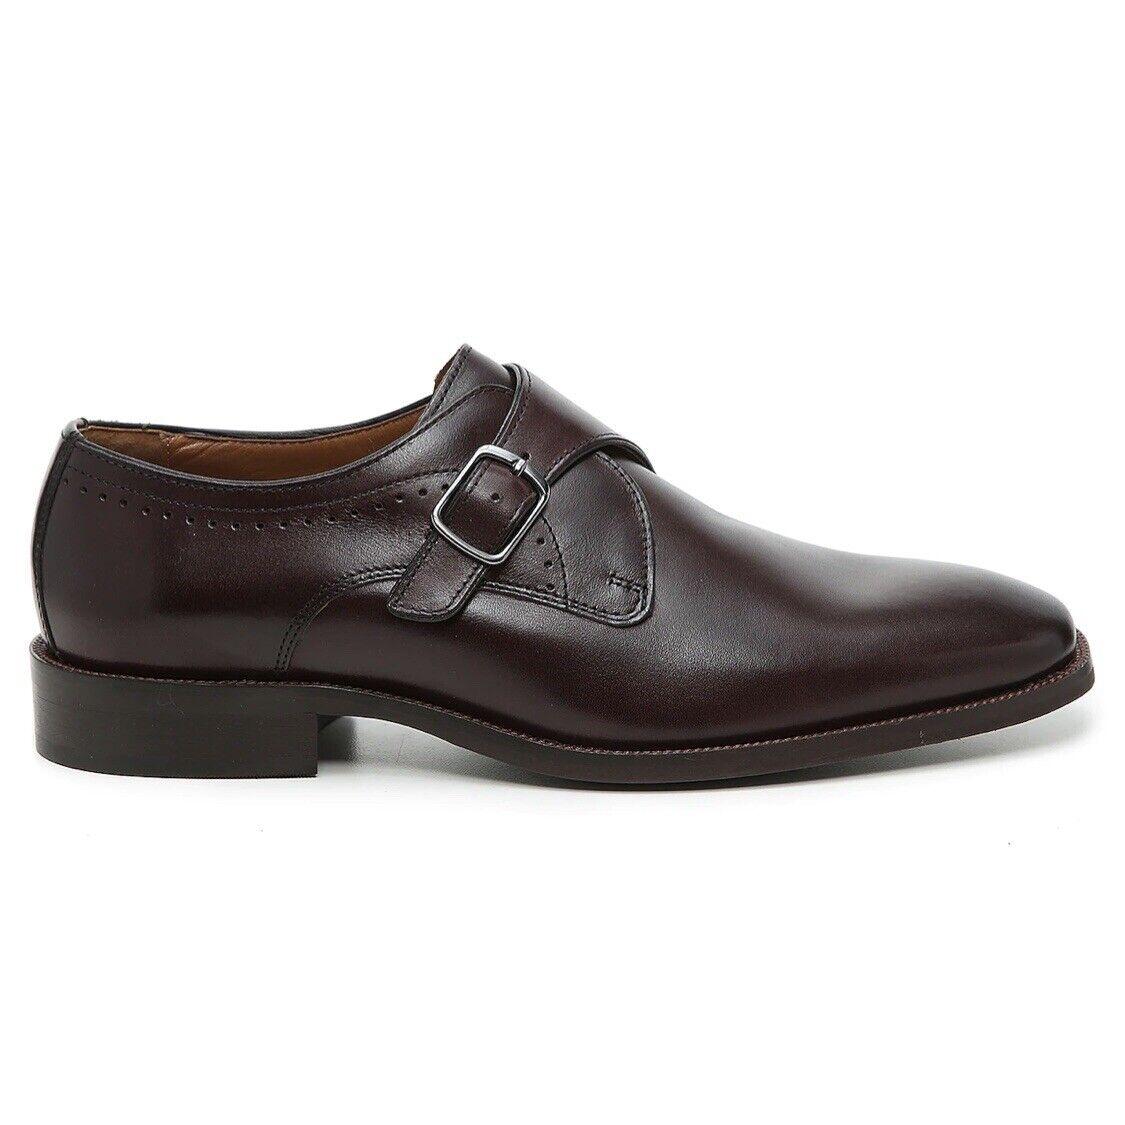 Johnston and Murphy Everette (Men's Size 12) Monk Strap Slip On Dress Shoe